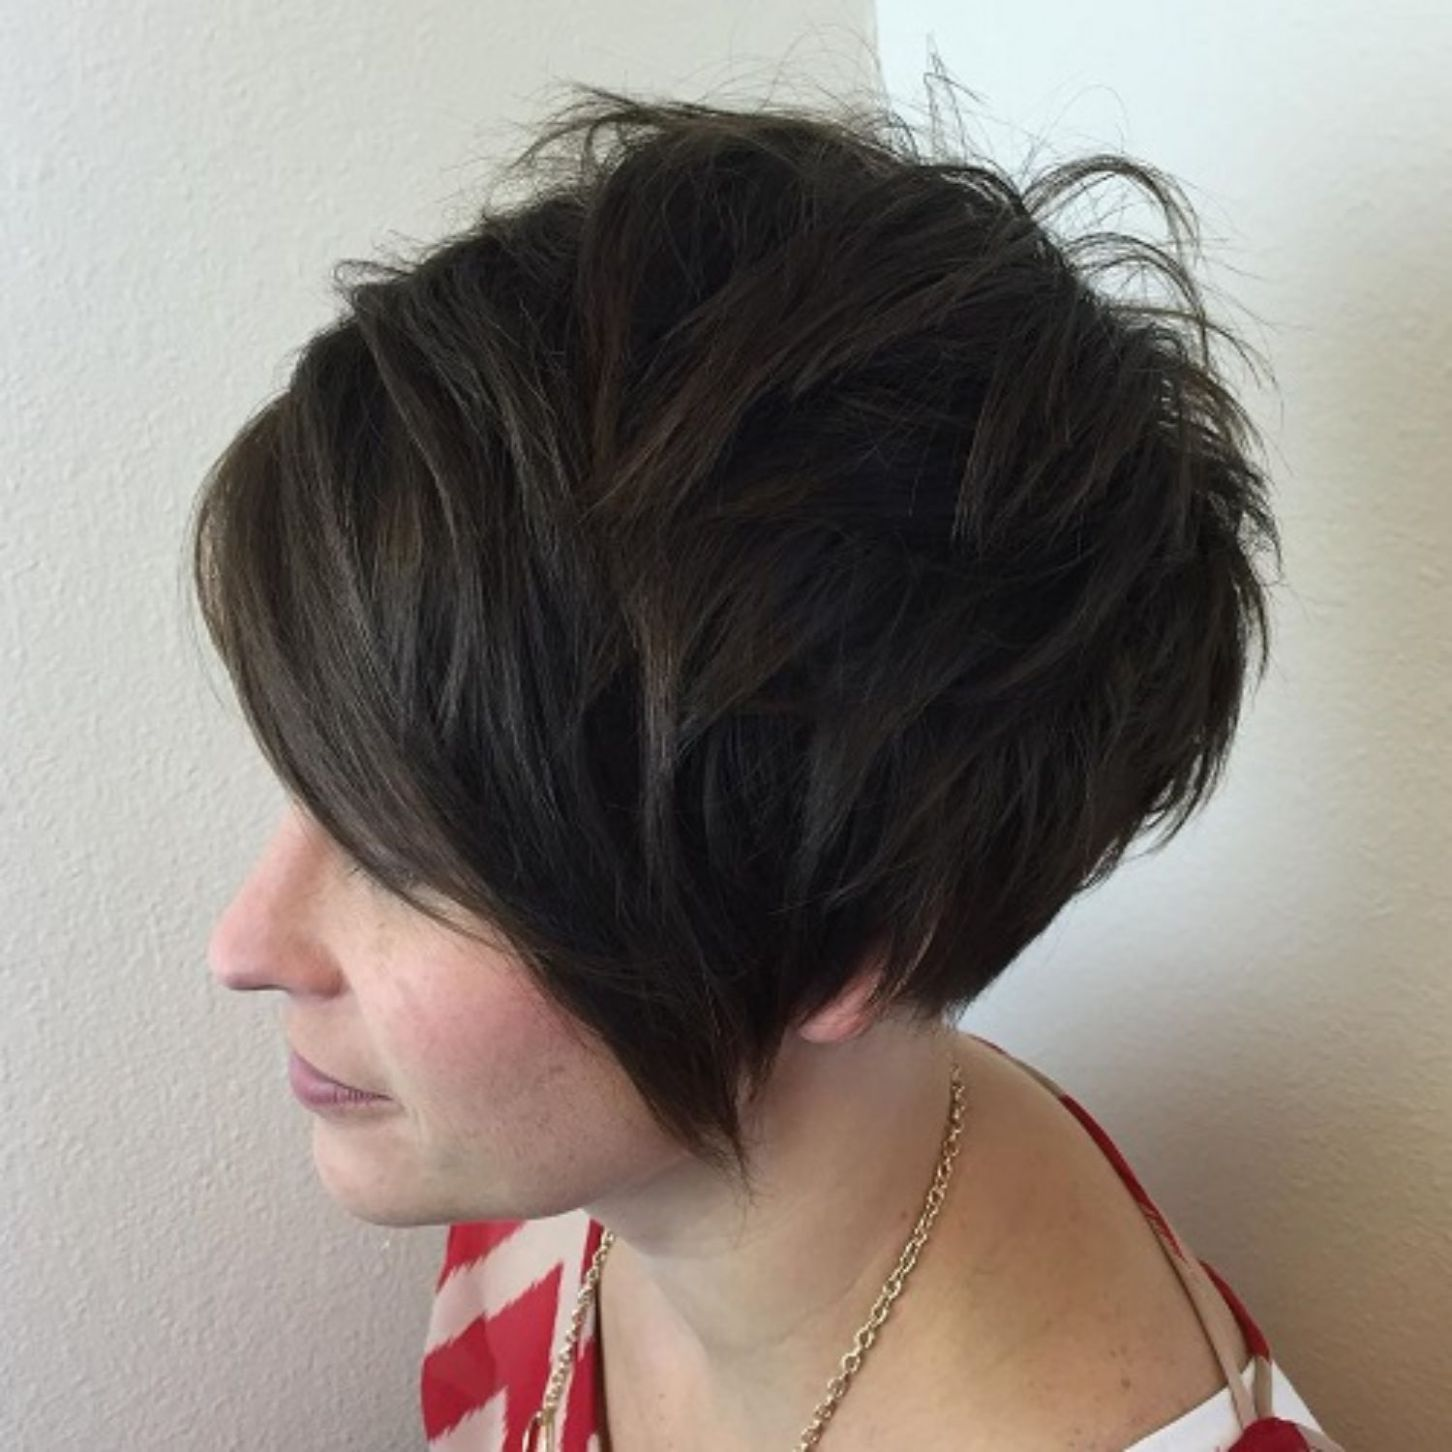 Long Choppy Pixie Haircut Trending Hairstyles Pinterest Hair